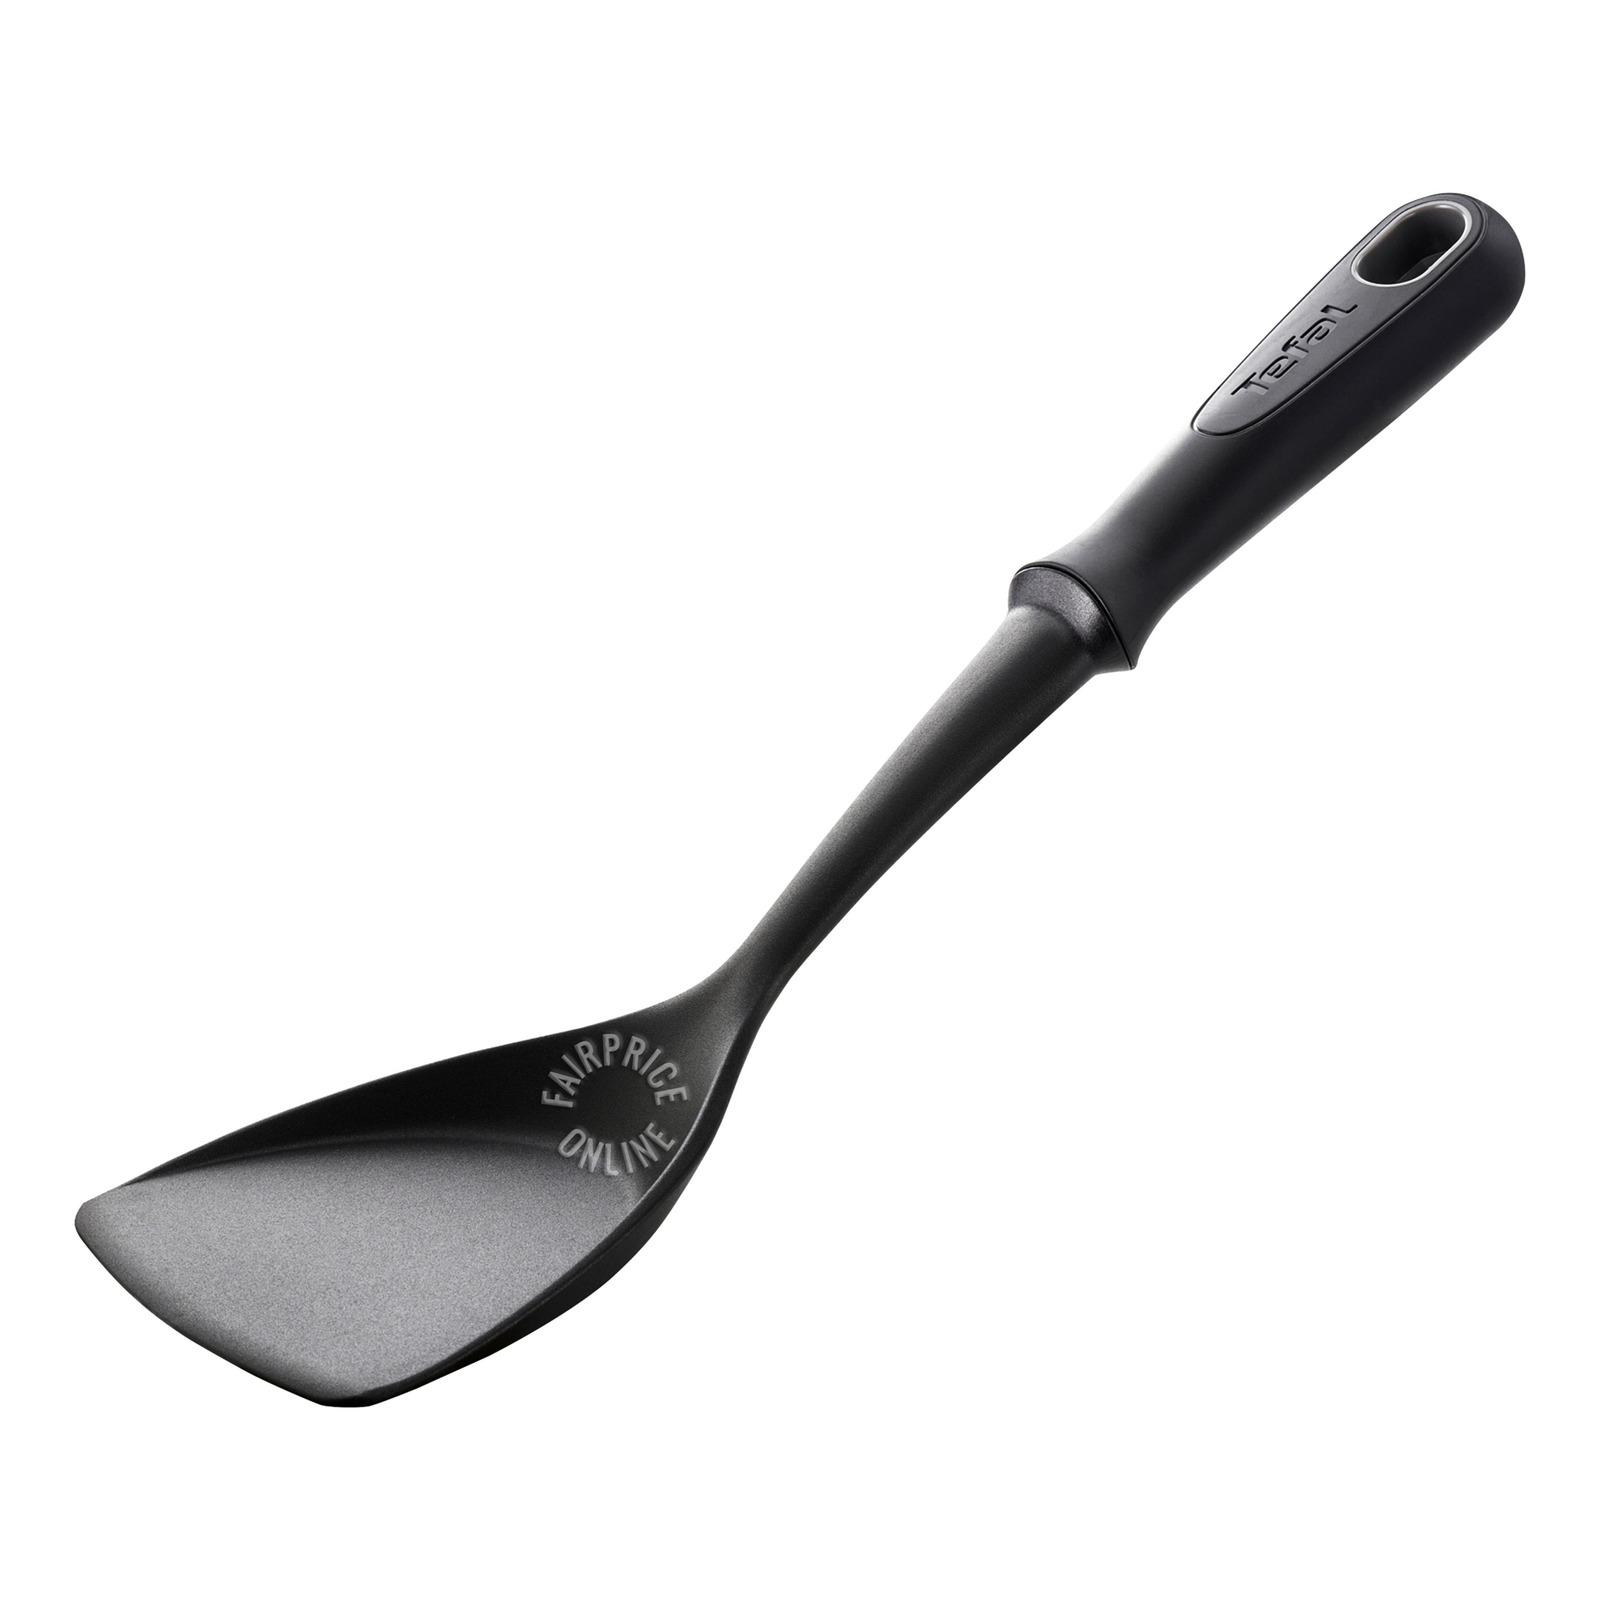 Tefal Touch Wok Spatula